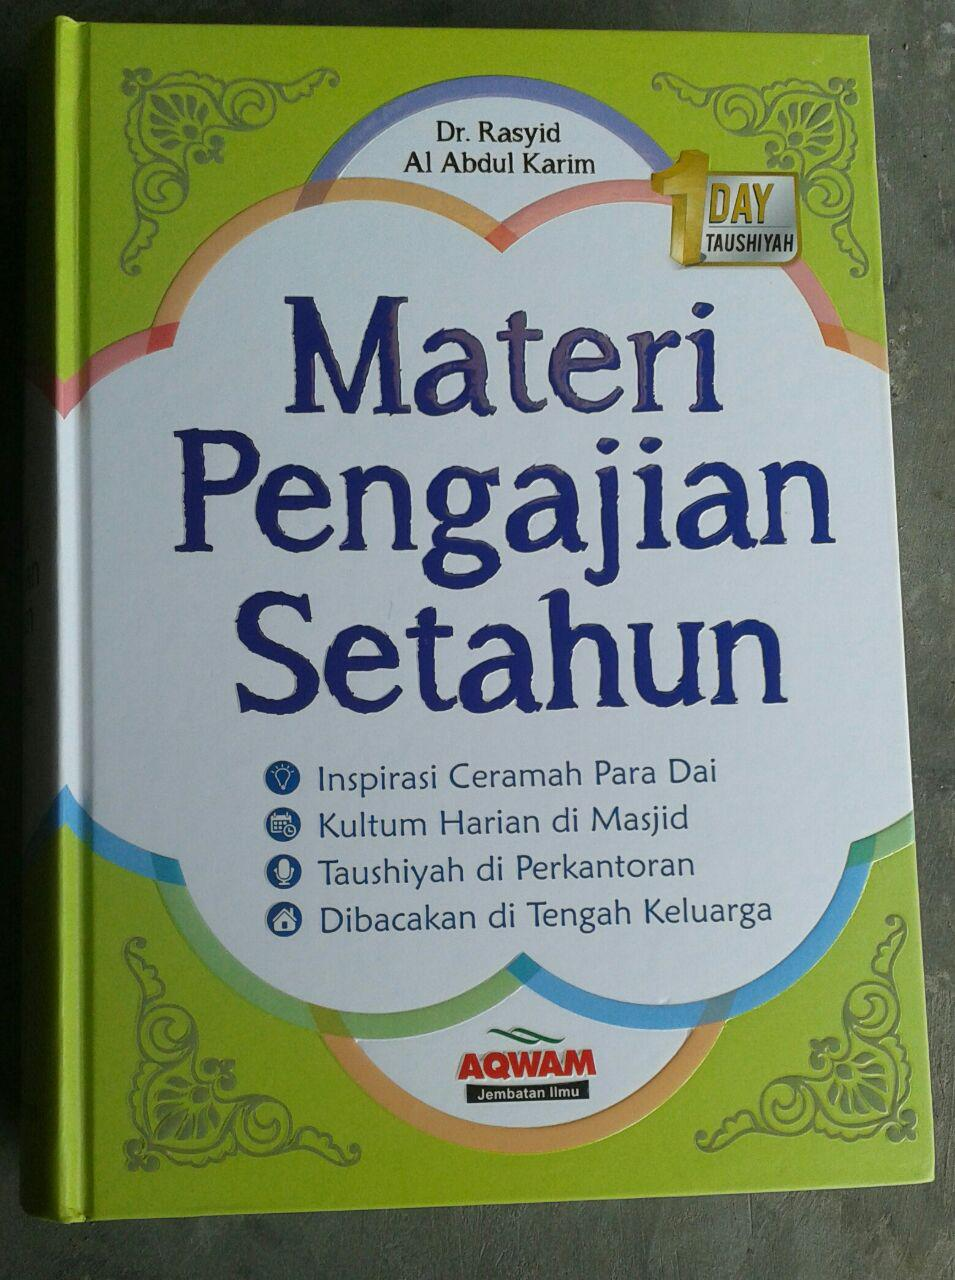 Buku Materi Pengajian Setahun cover 2